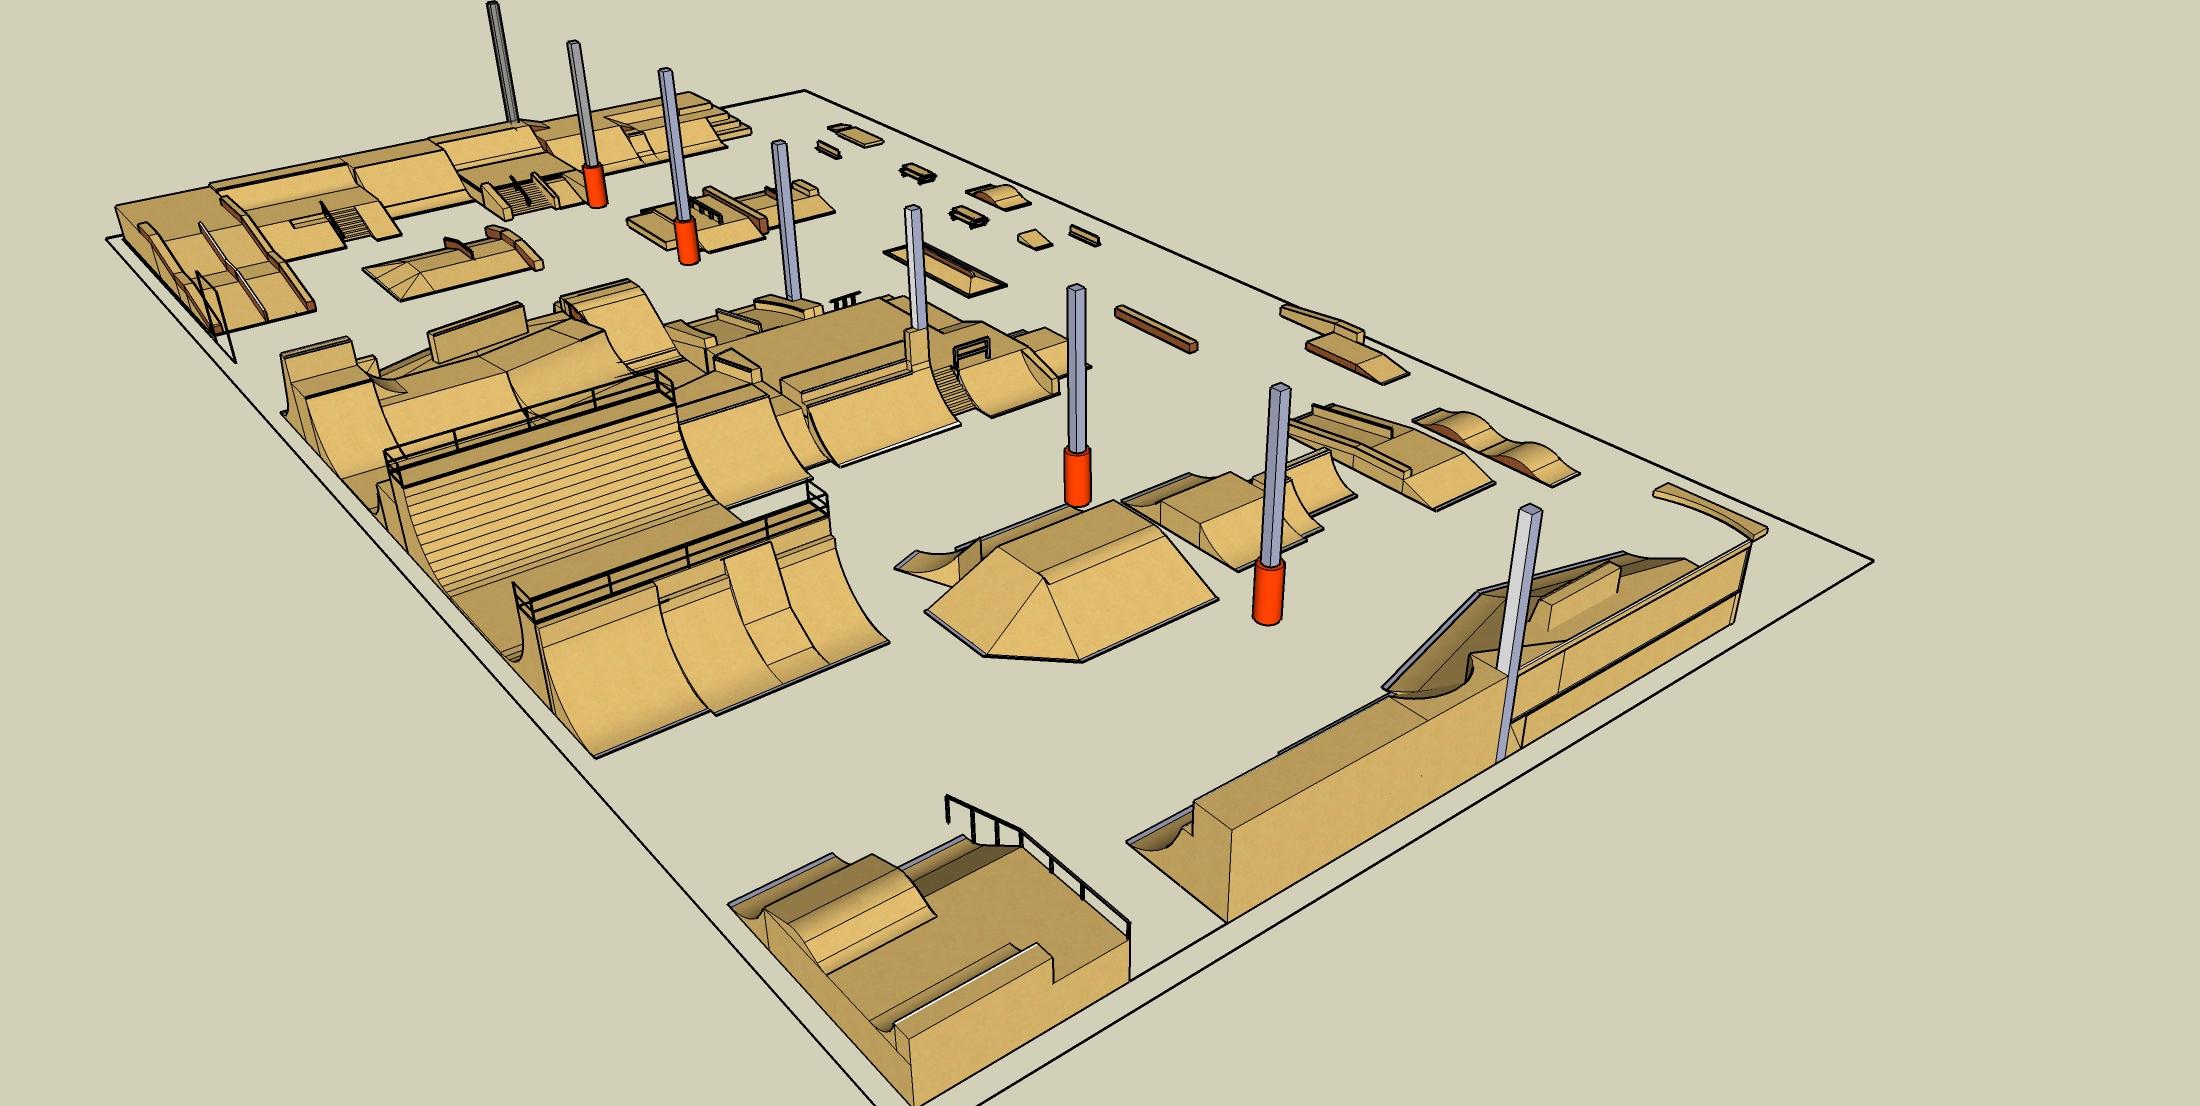 В бютжете Павлограда предусмотрено 700 тыс грн на постройку скейт-парка